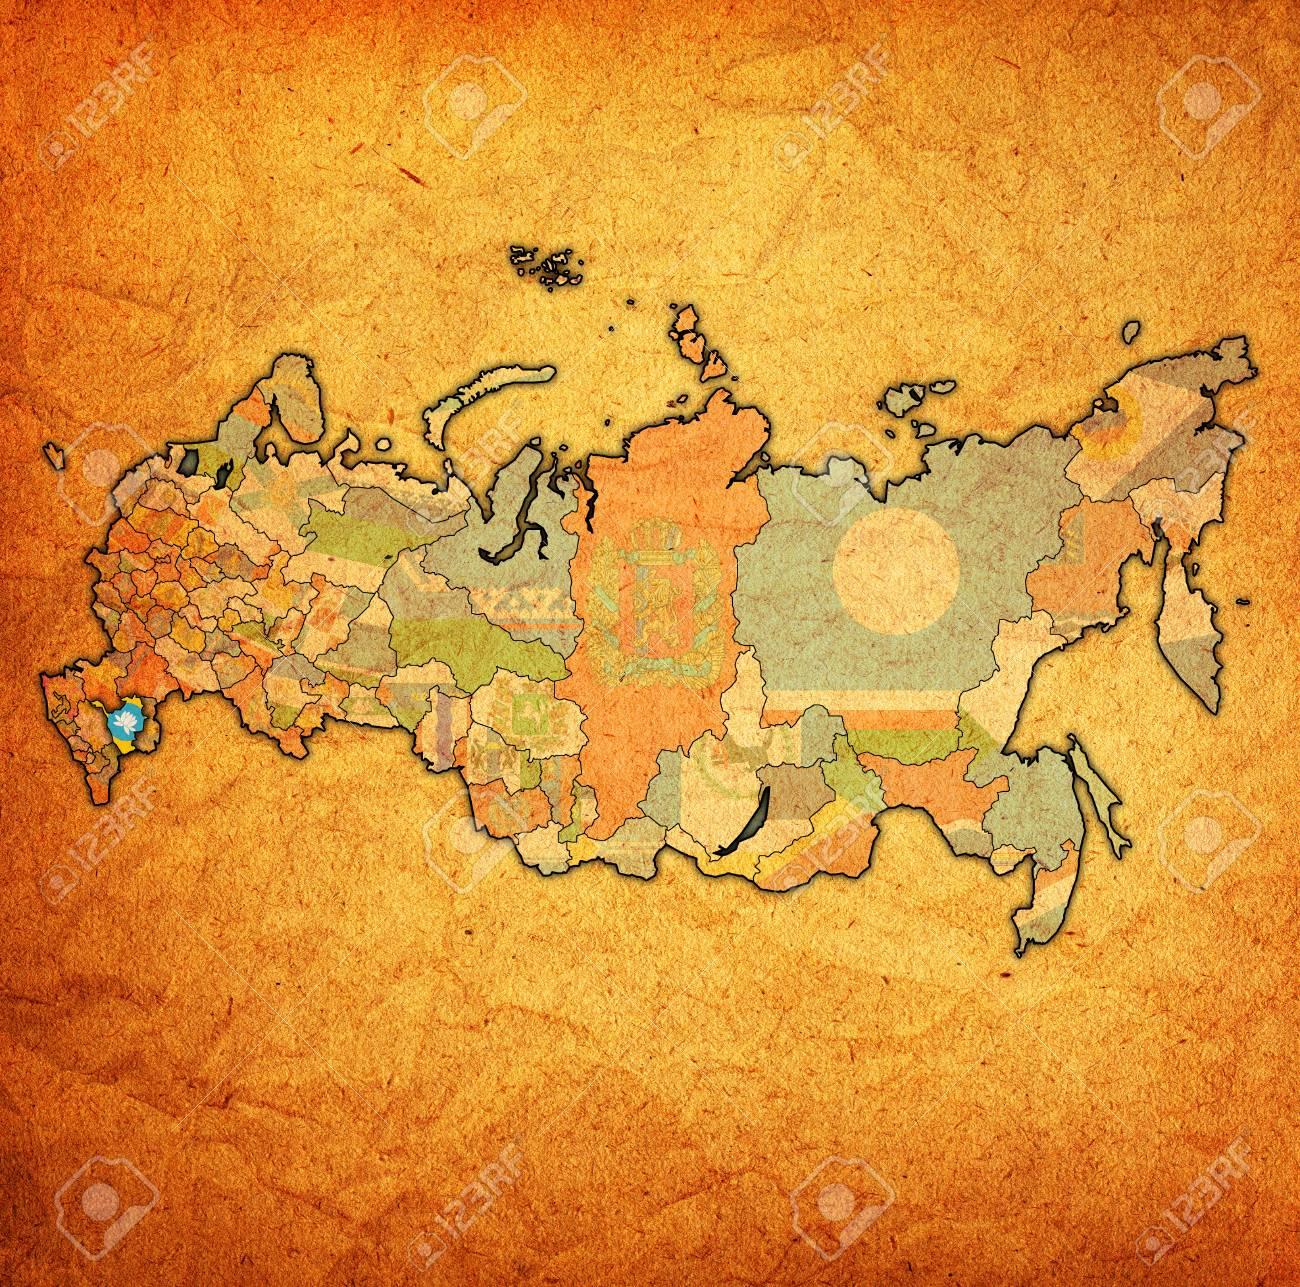 chuvashia russia map, croatia russia map, tuva russia map, jewish autonomous oblast russia map, slovakia russia map, sakha russia map, canada russia map, iceland russia map, afghanistan russia map, elista russia map, albania russia map, malta russia map, altai krai russia map, south ossetia russia map, tyva russia map, novy urengoy russia map, khakassia russia map, india russia map, tatarstan russia map, france russia map, on kalmykia russia map